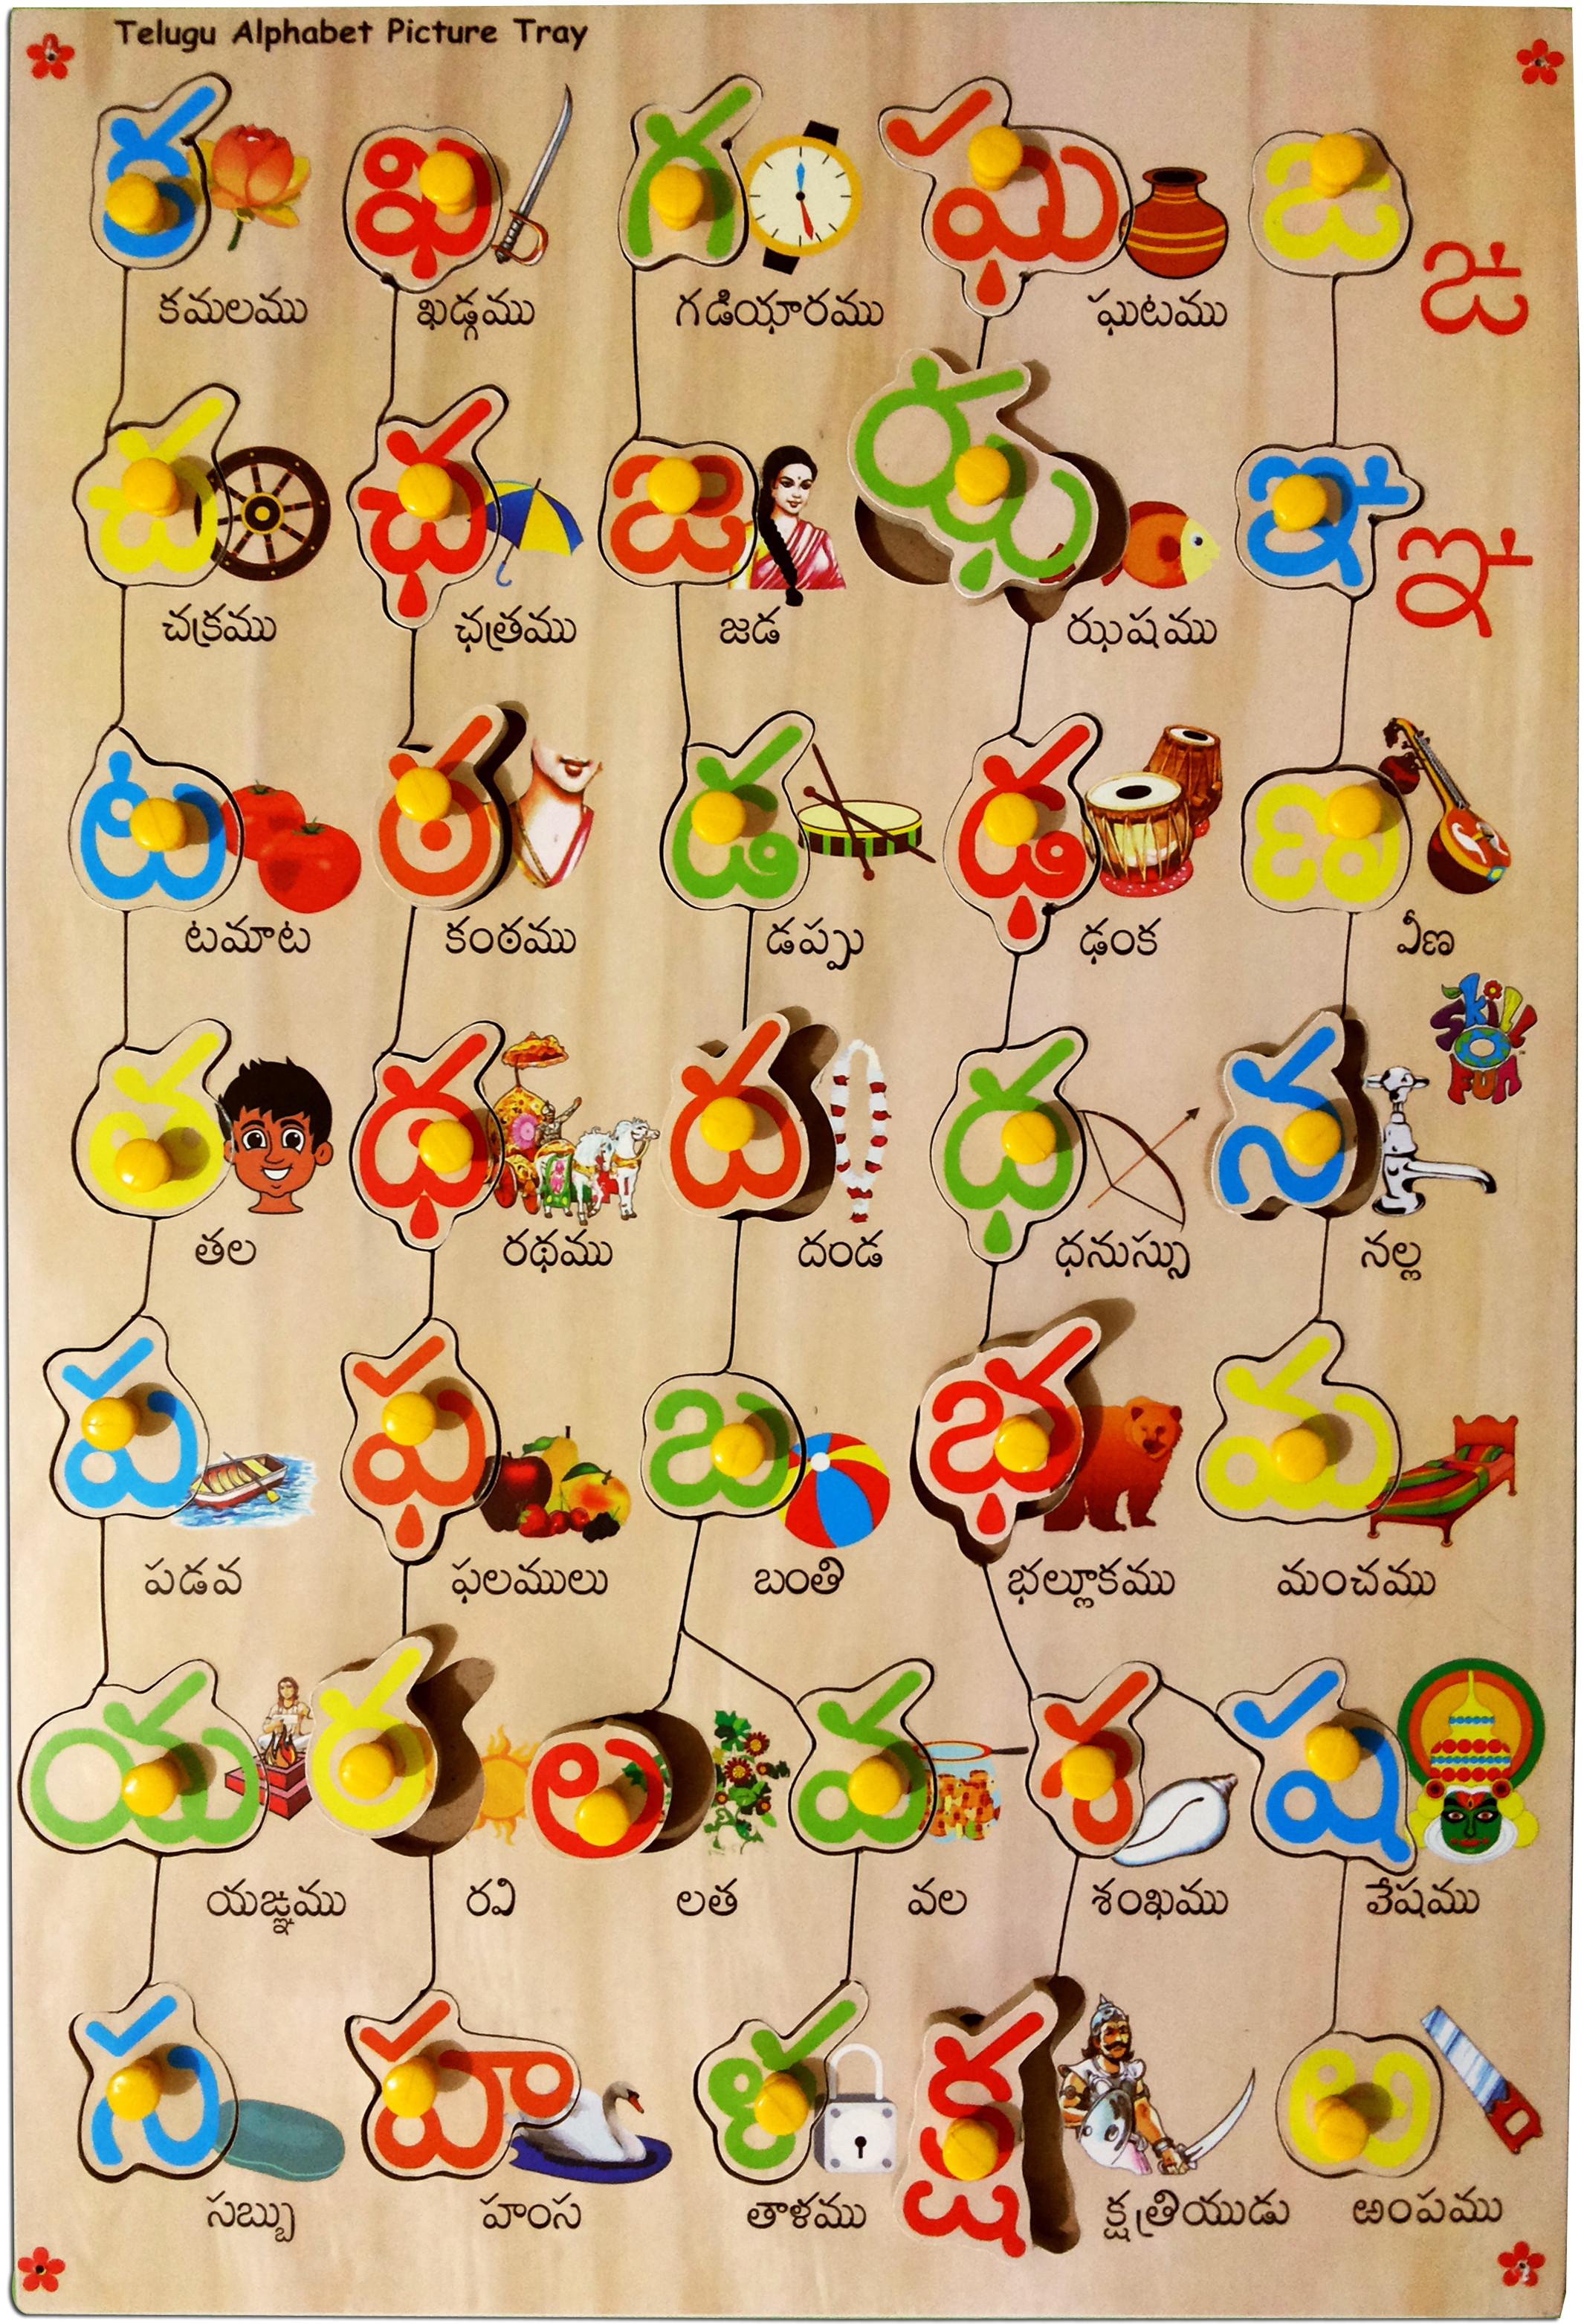 Printables Telugu Alphabets Chart telugu alphabets chart related keywords suggestions skillofun lower alphabet tray with picture original imadhd6gktmzpz9z